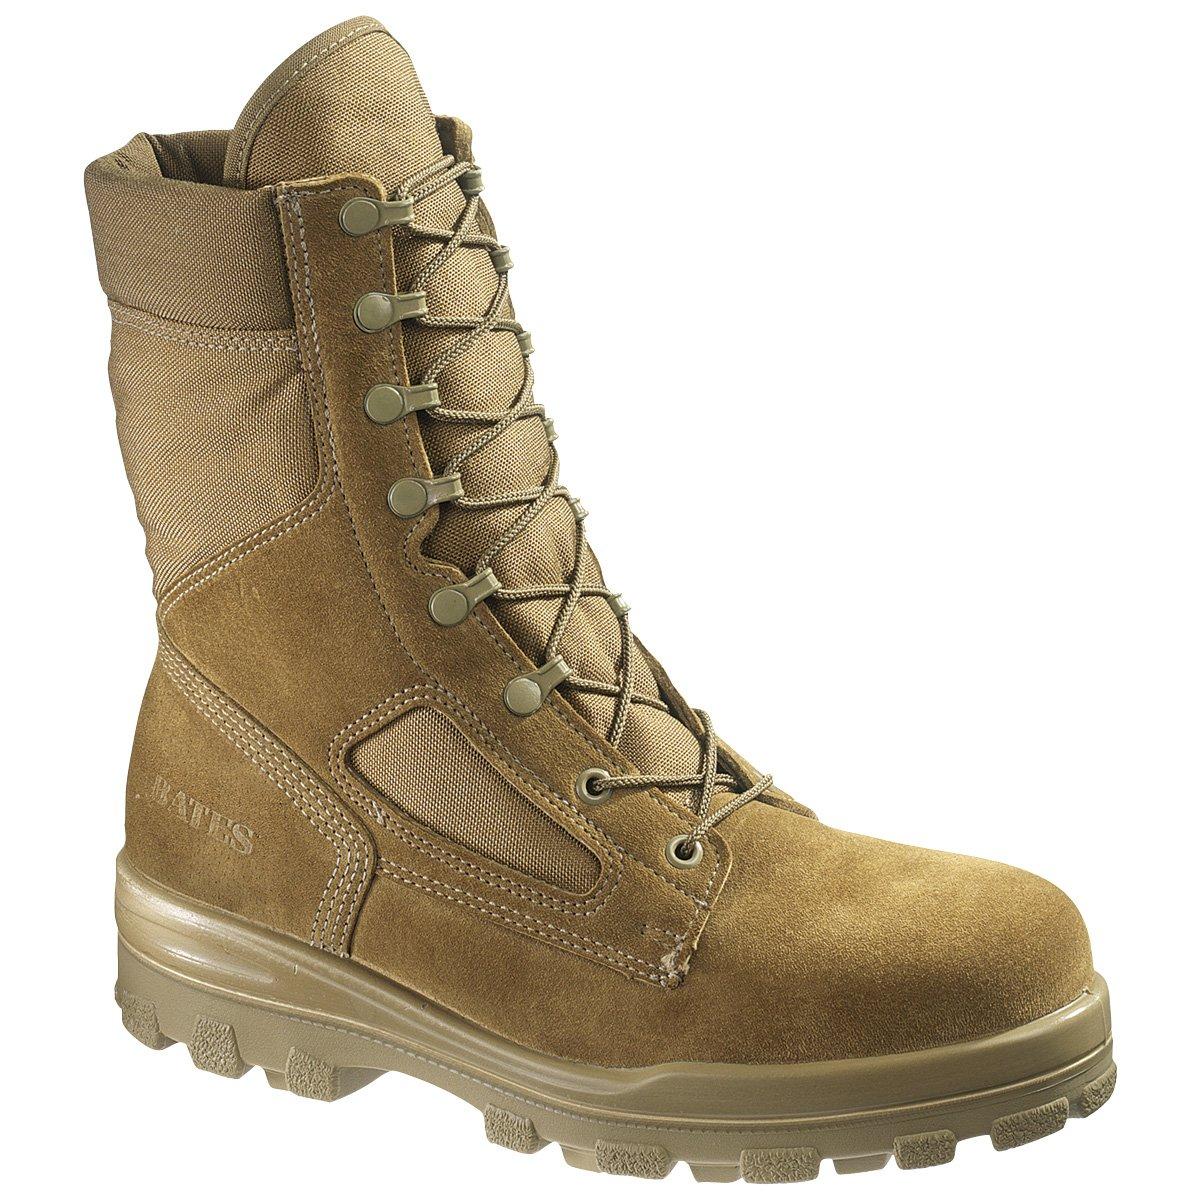 Women's Bates DuraShocks Steel Toe Boots Olive Mojave, OLIVE MOJAVE, 6.5